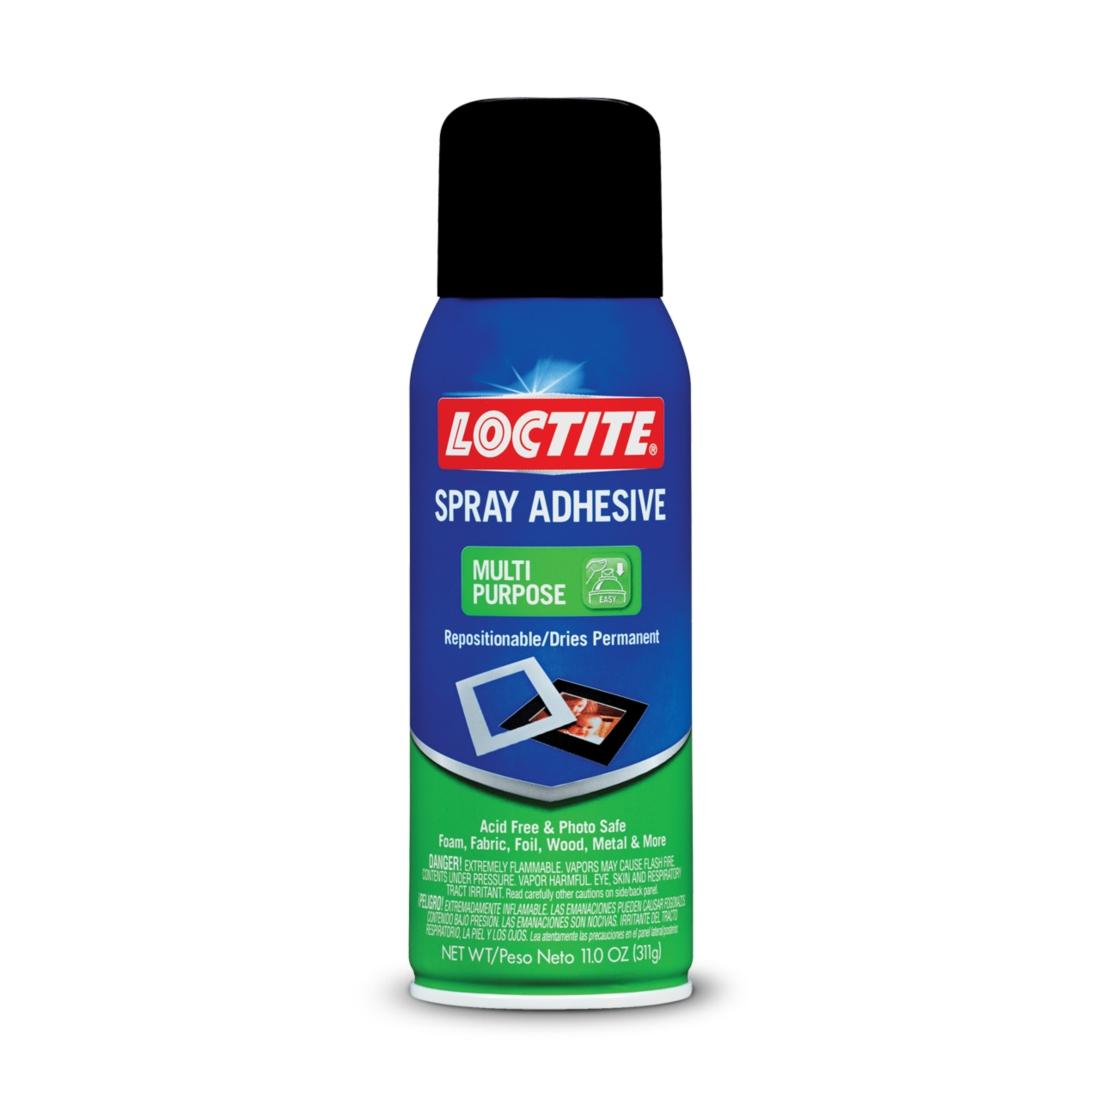 Loctite® Spray Adhesive Multi Purpose